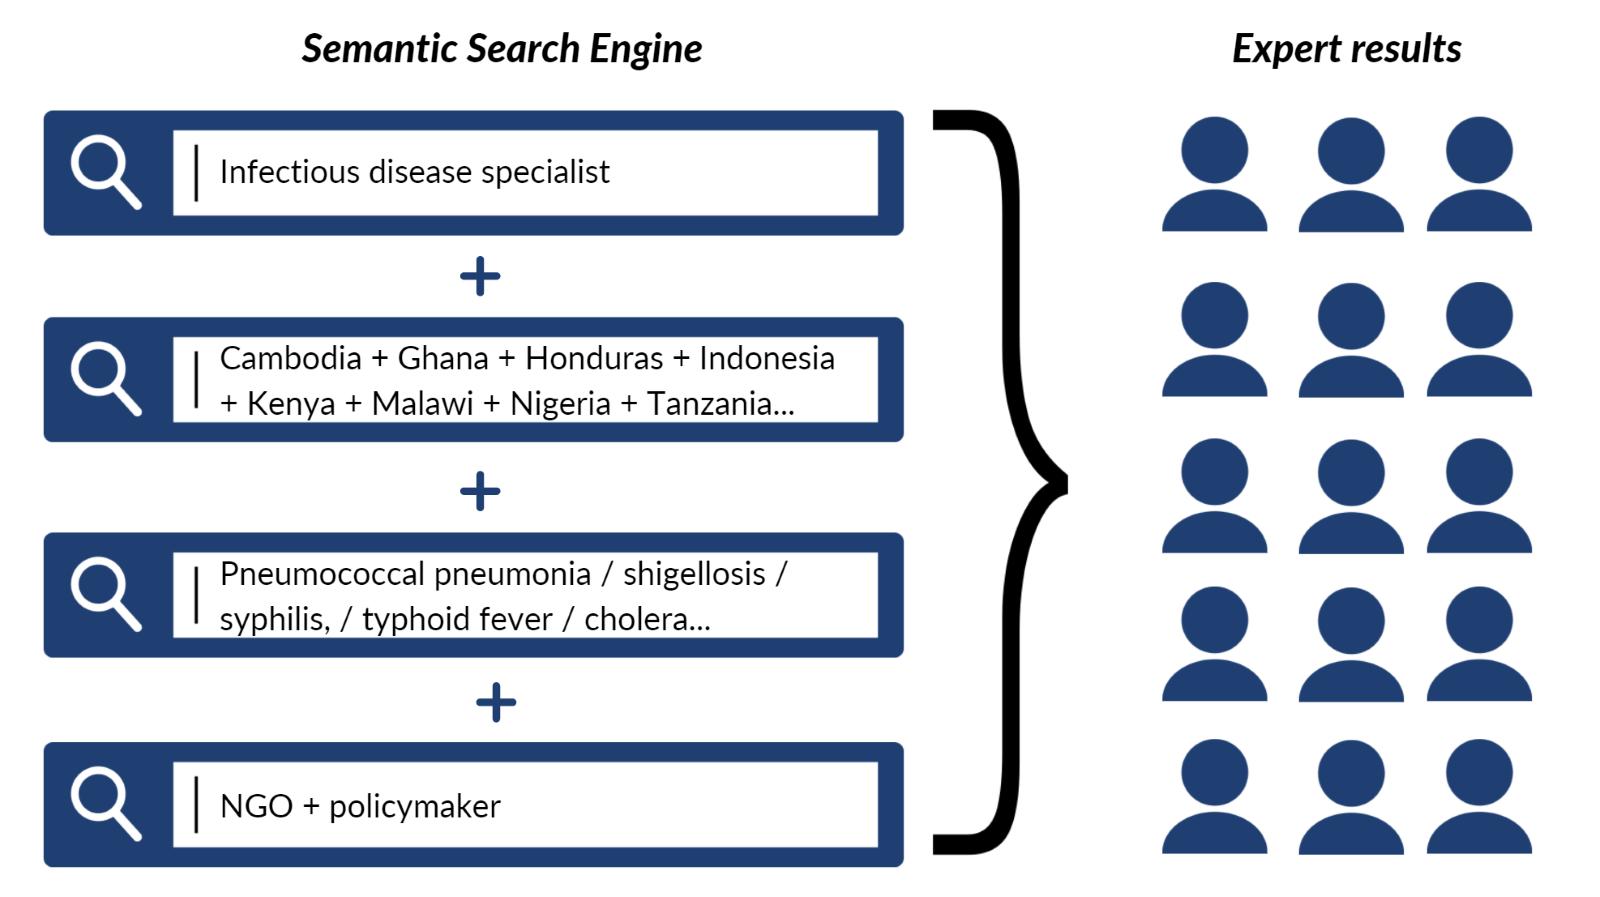 techspert.io Semantic Search Engine